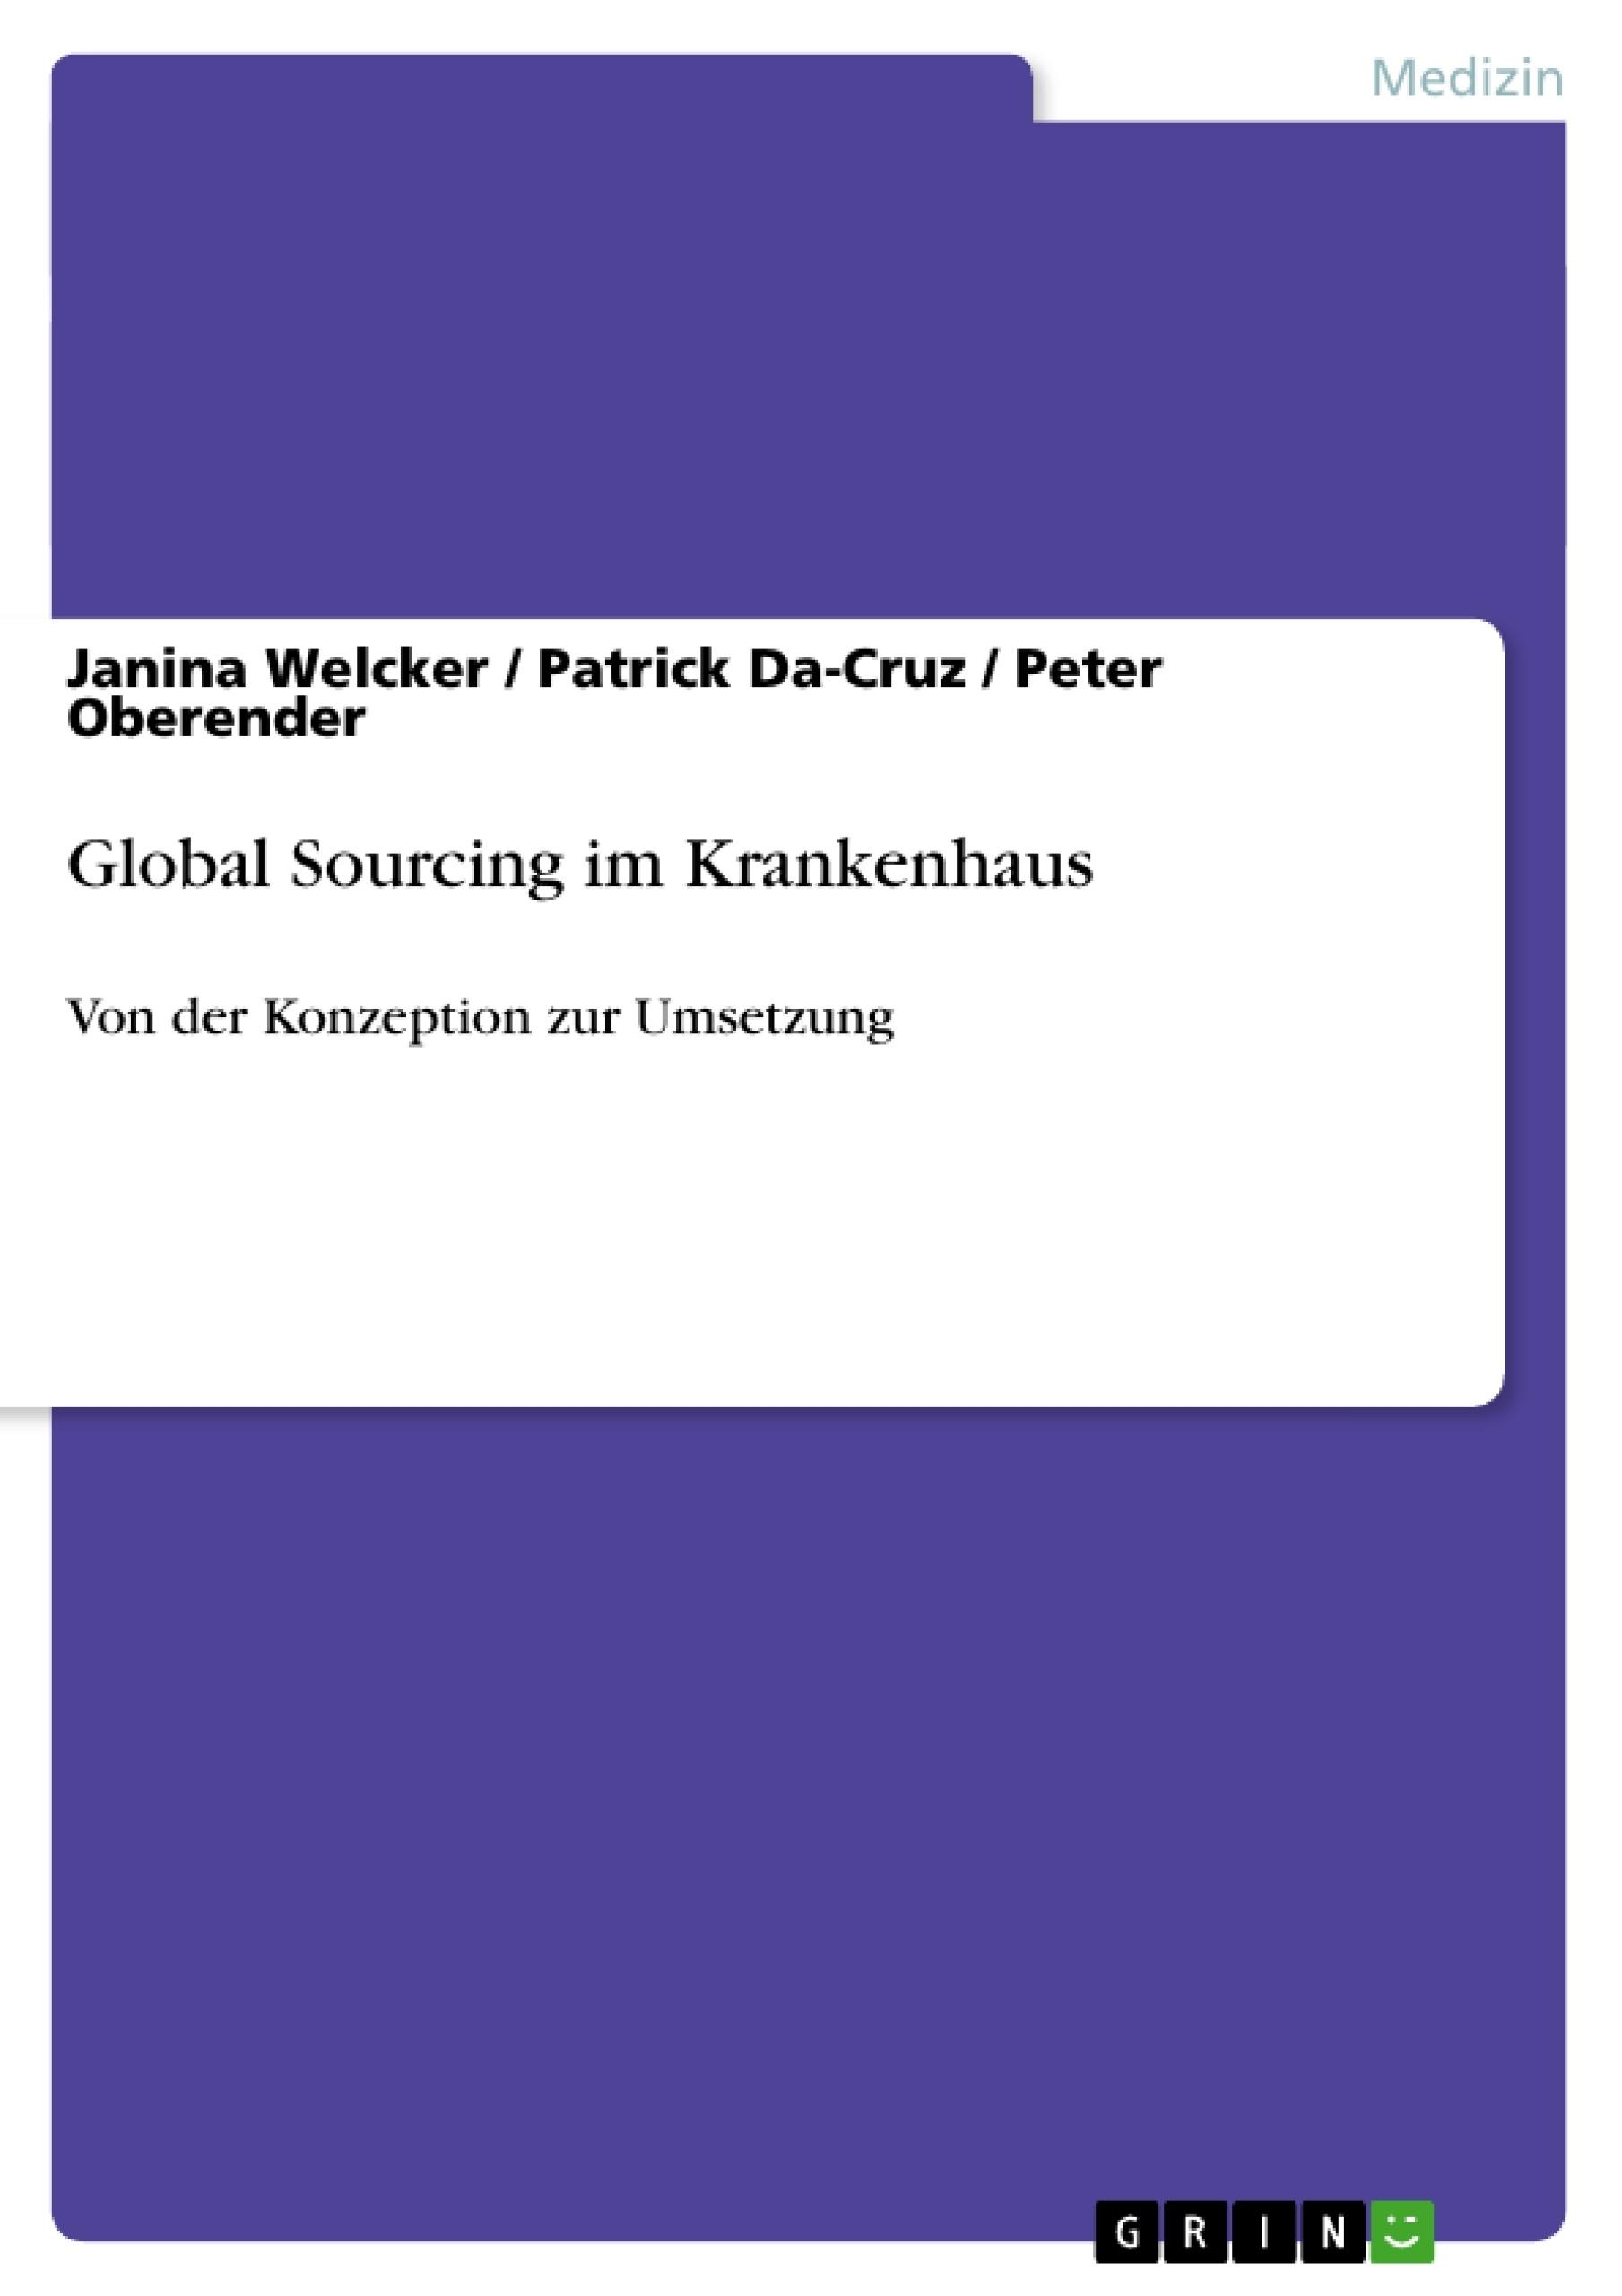 Titel: Global Sourcing im Krankenhaus